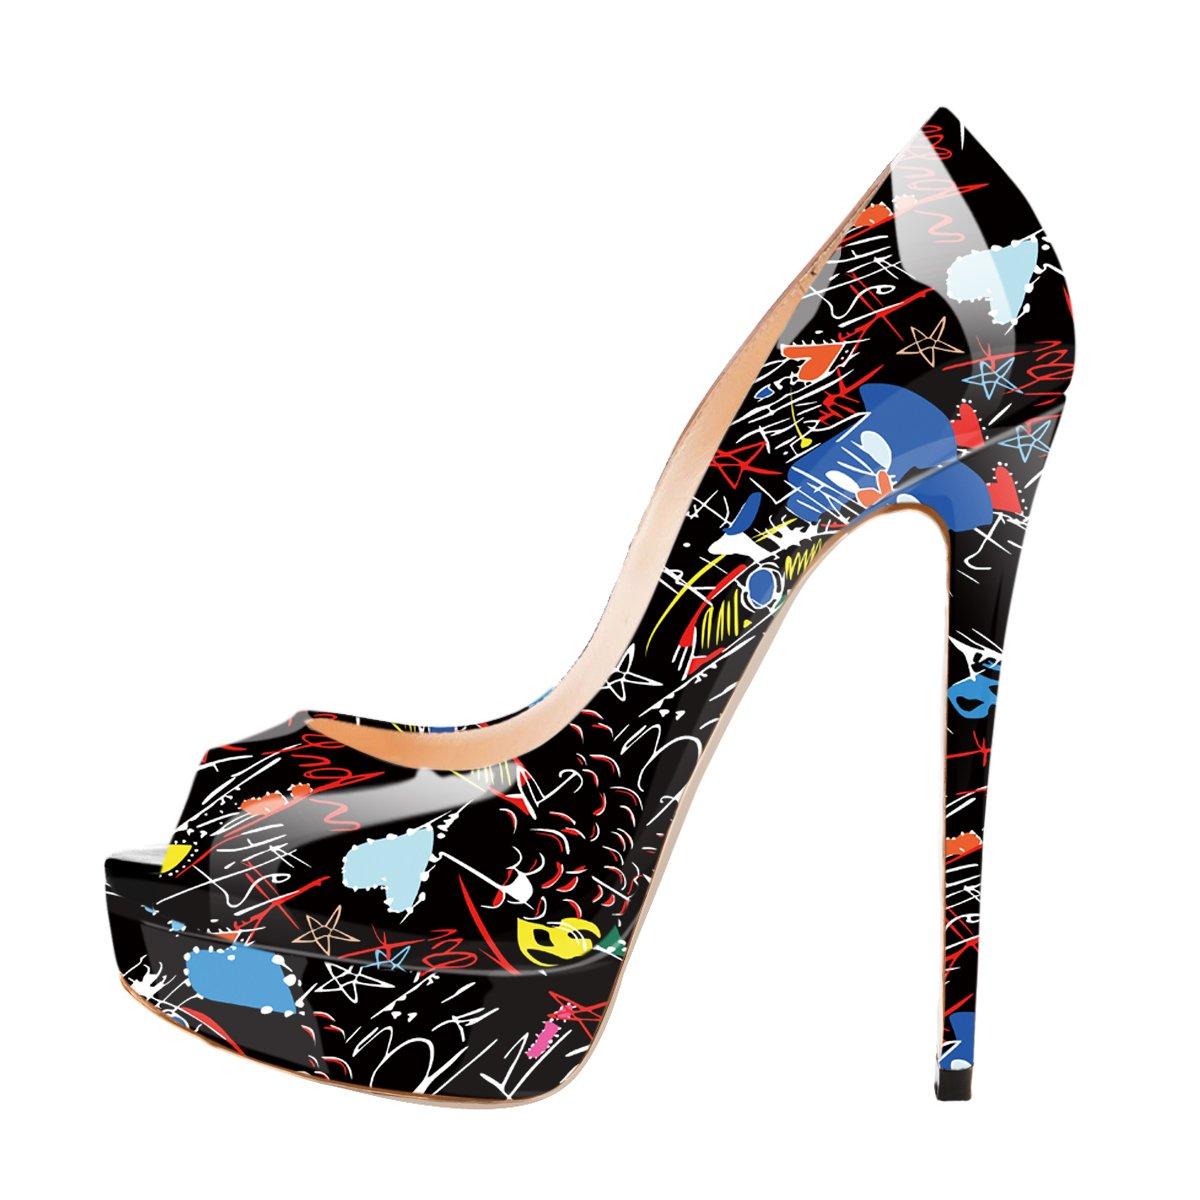 Onlymaker Damenschuhe High Heels Pumps Peep Toe Stiletto Plateau Absatz Lackleder  42 EU|Black Graffiti-peep toe